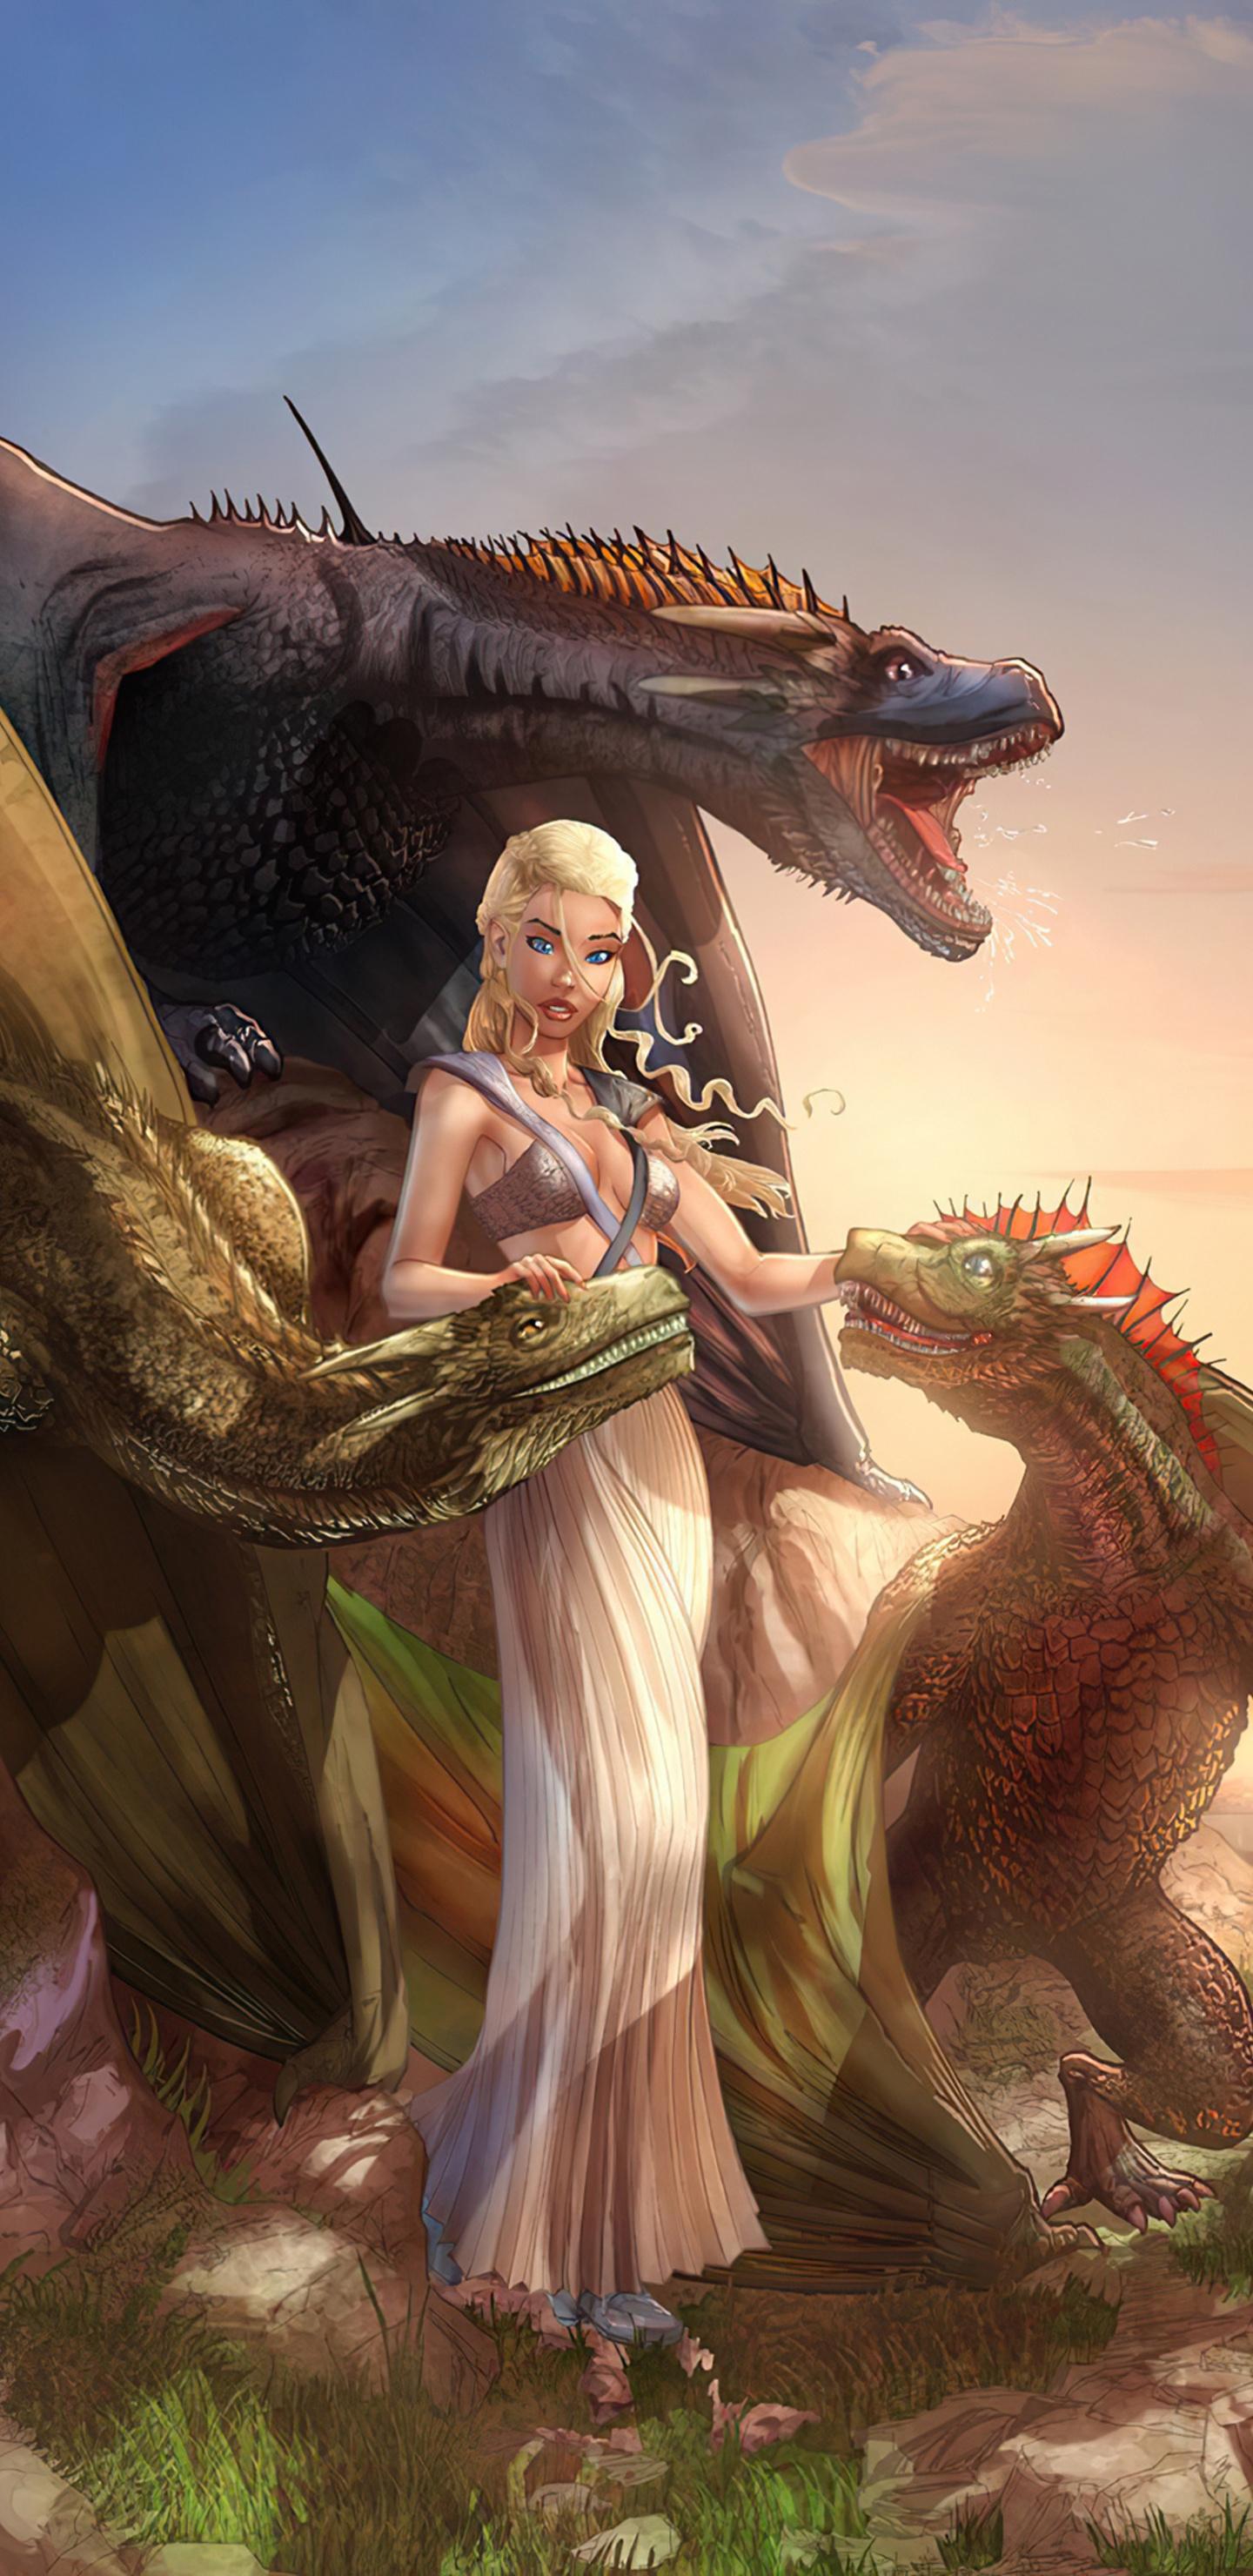 daenerys-targaryen-with-dragons-4k-04.jpg